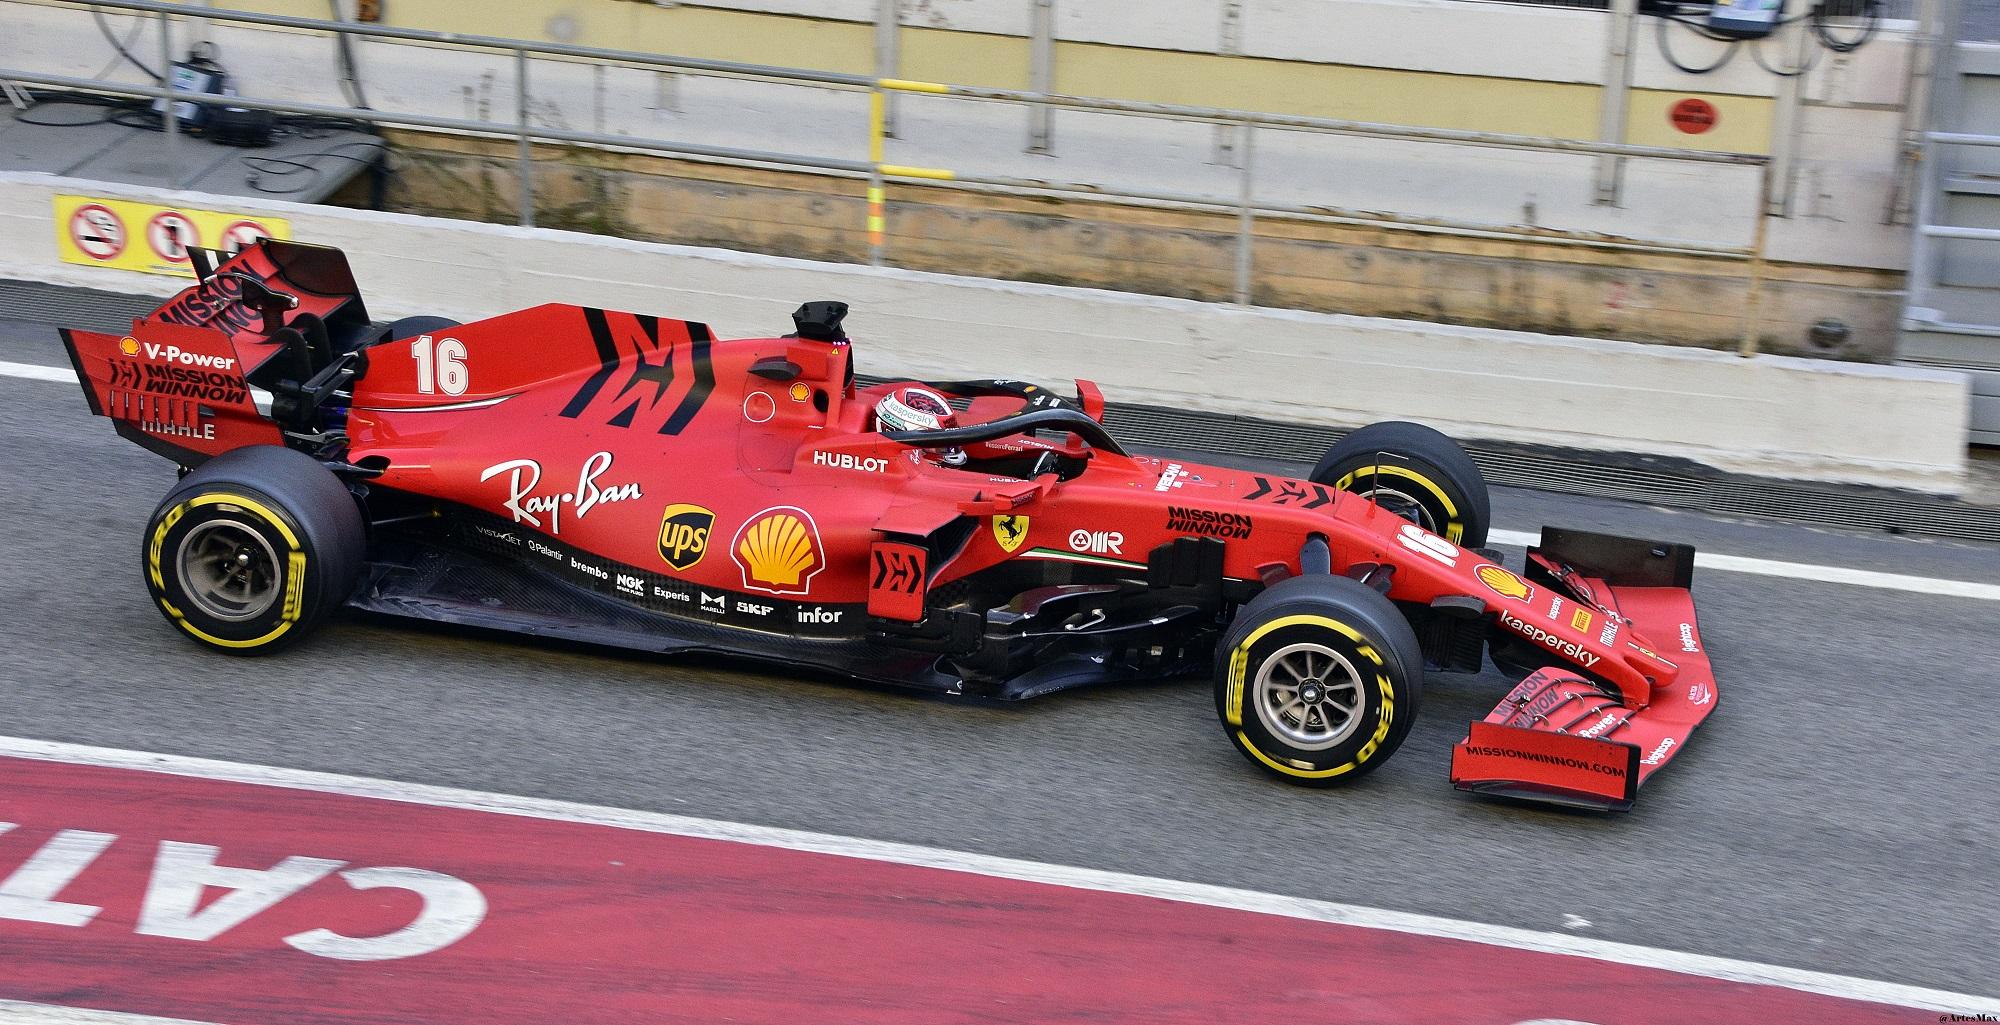 2020_Formula_One_tests_Barcelona,_Ferrar